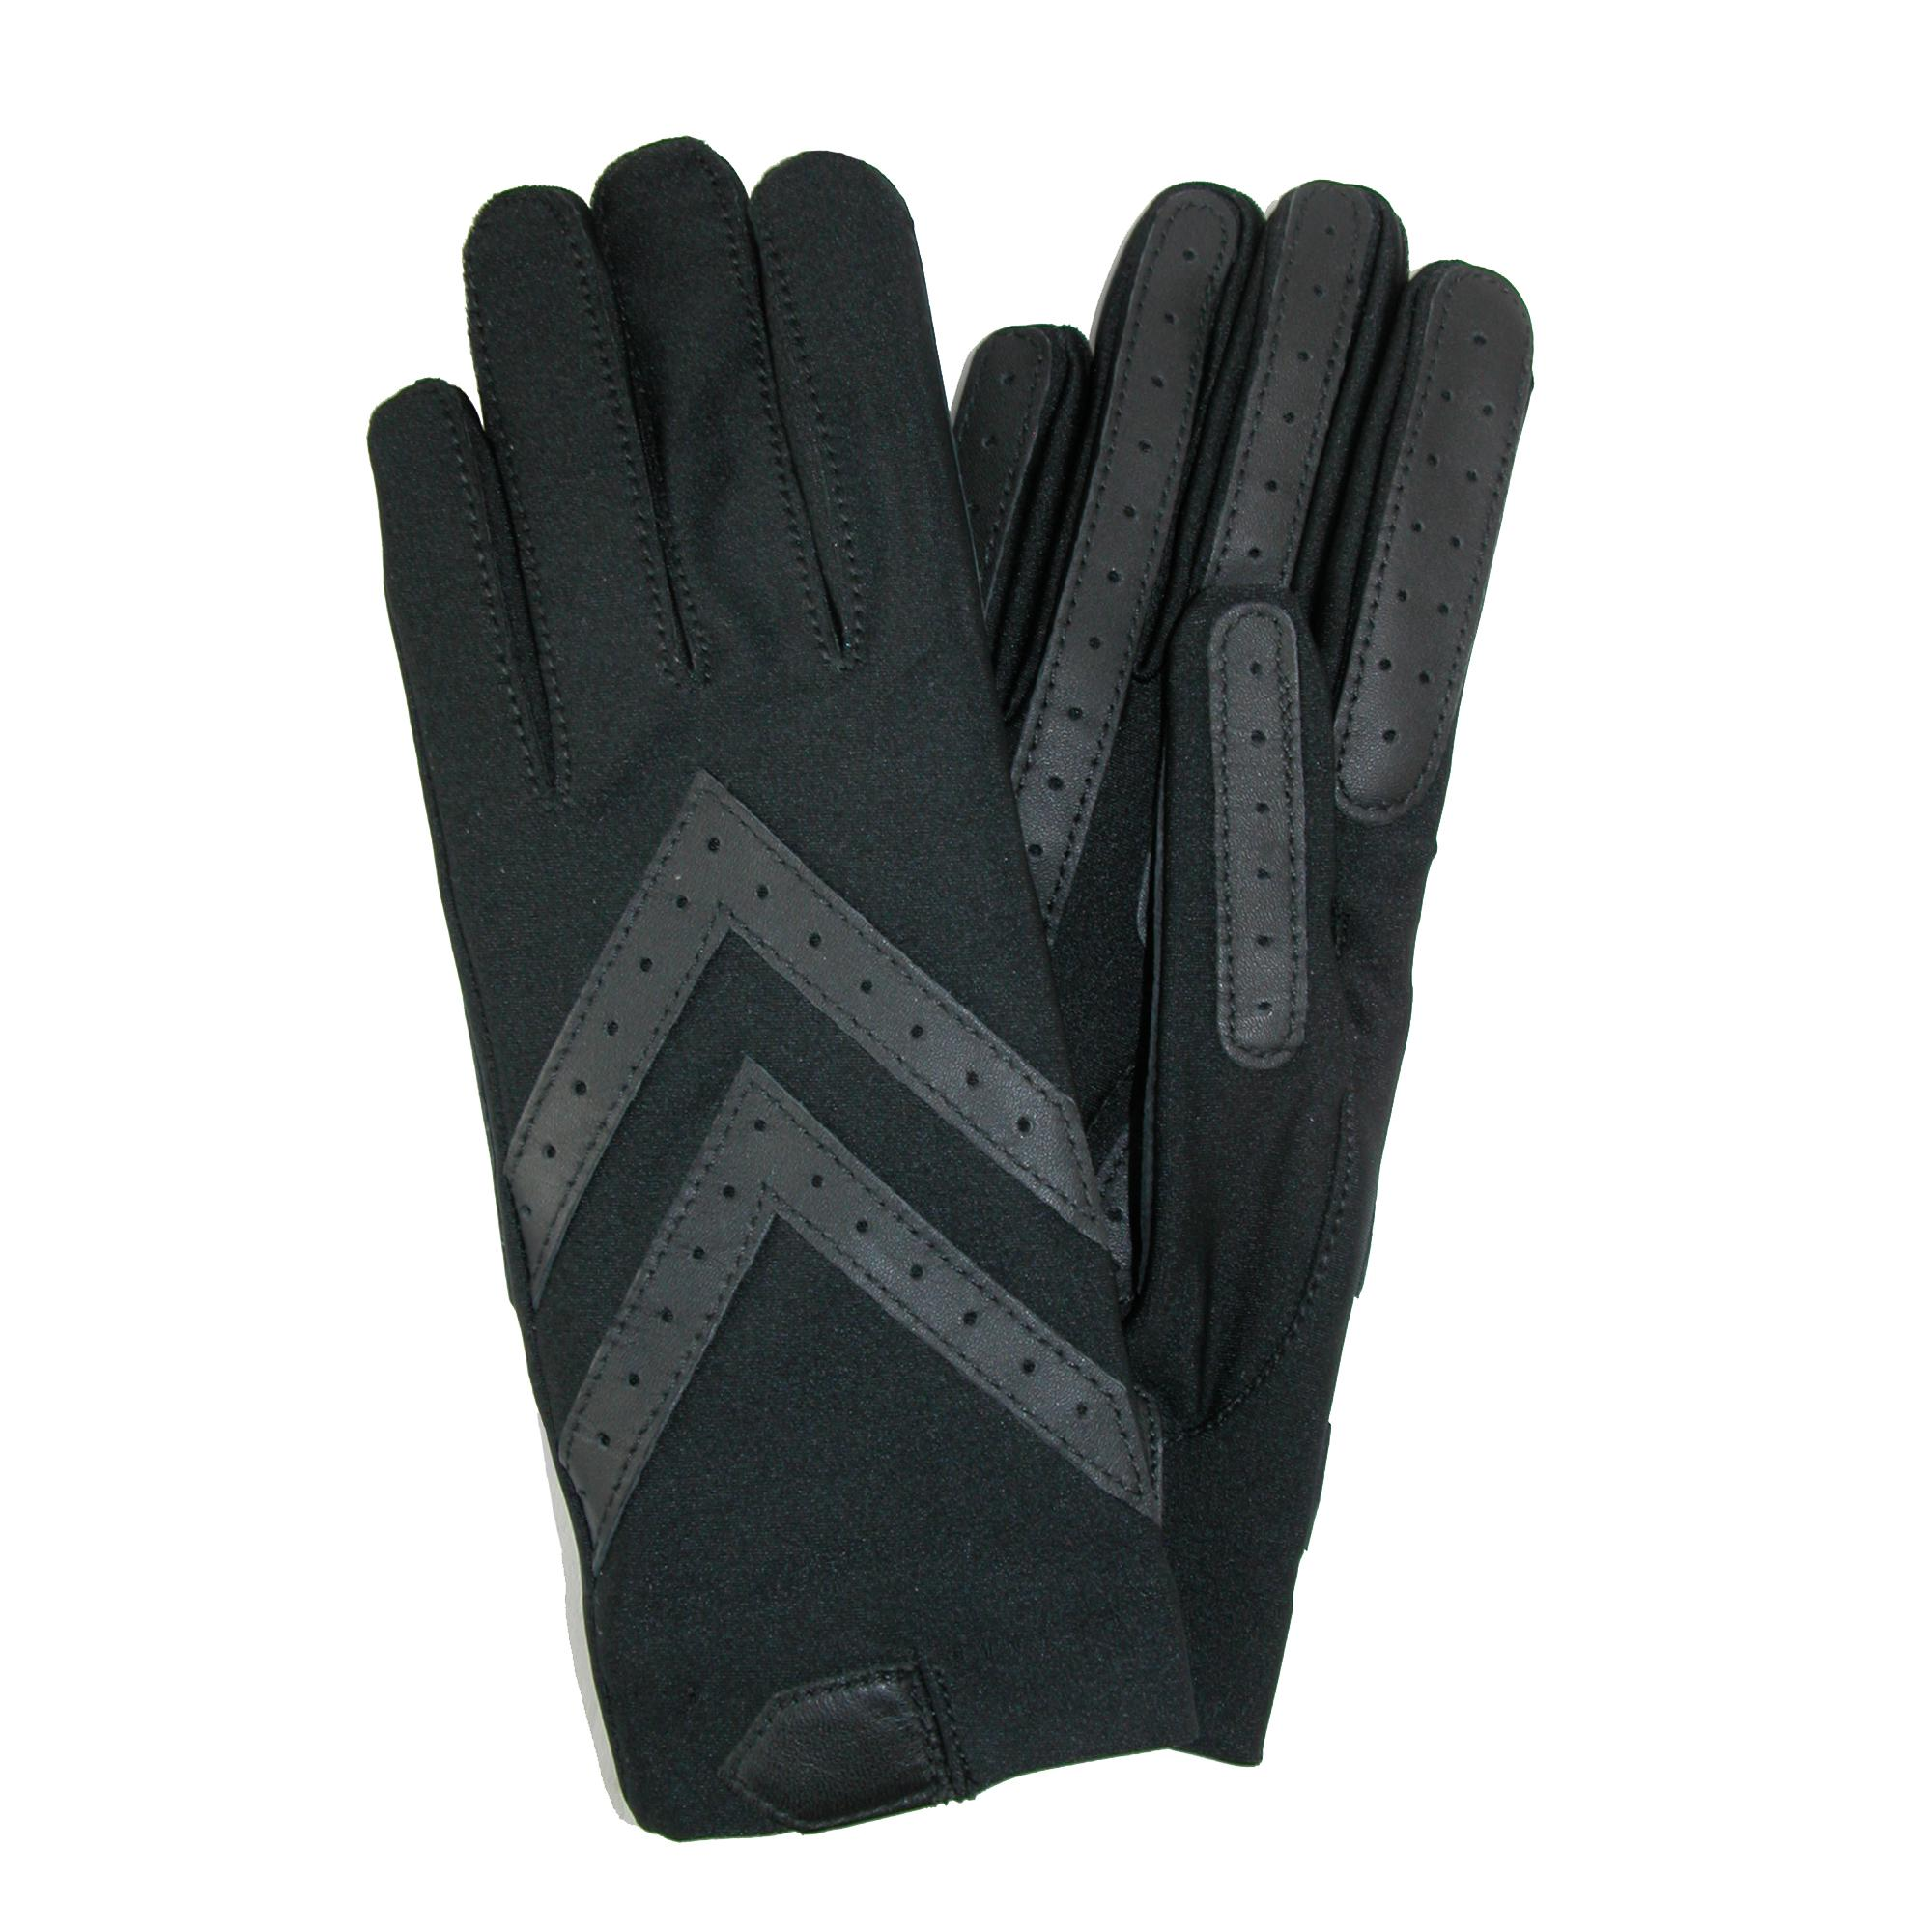 Fingerless driving gloves ebay - Picture 3 Of 16